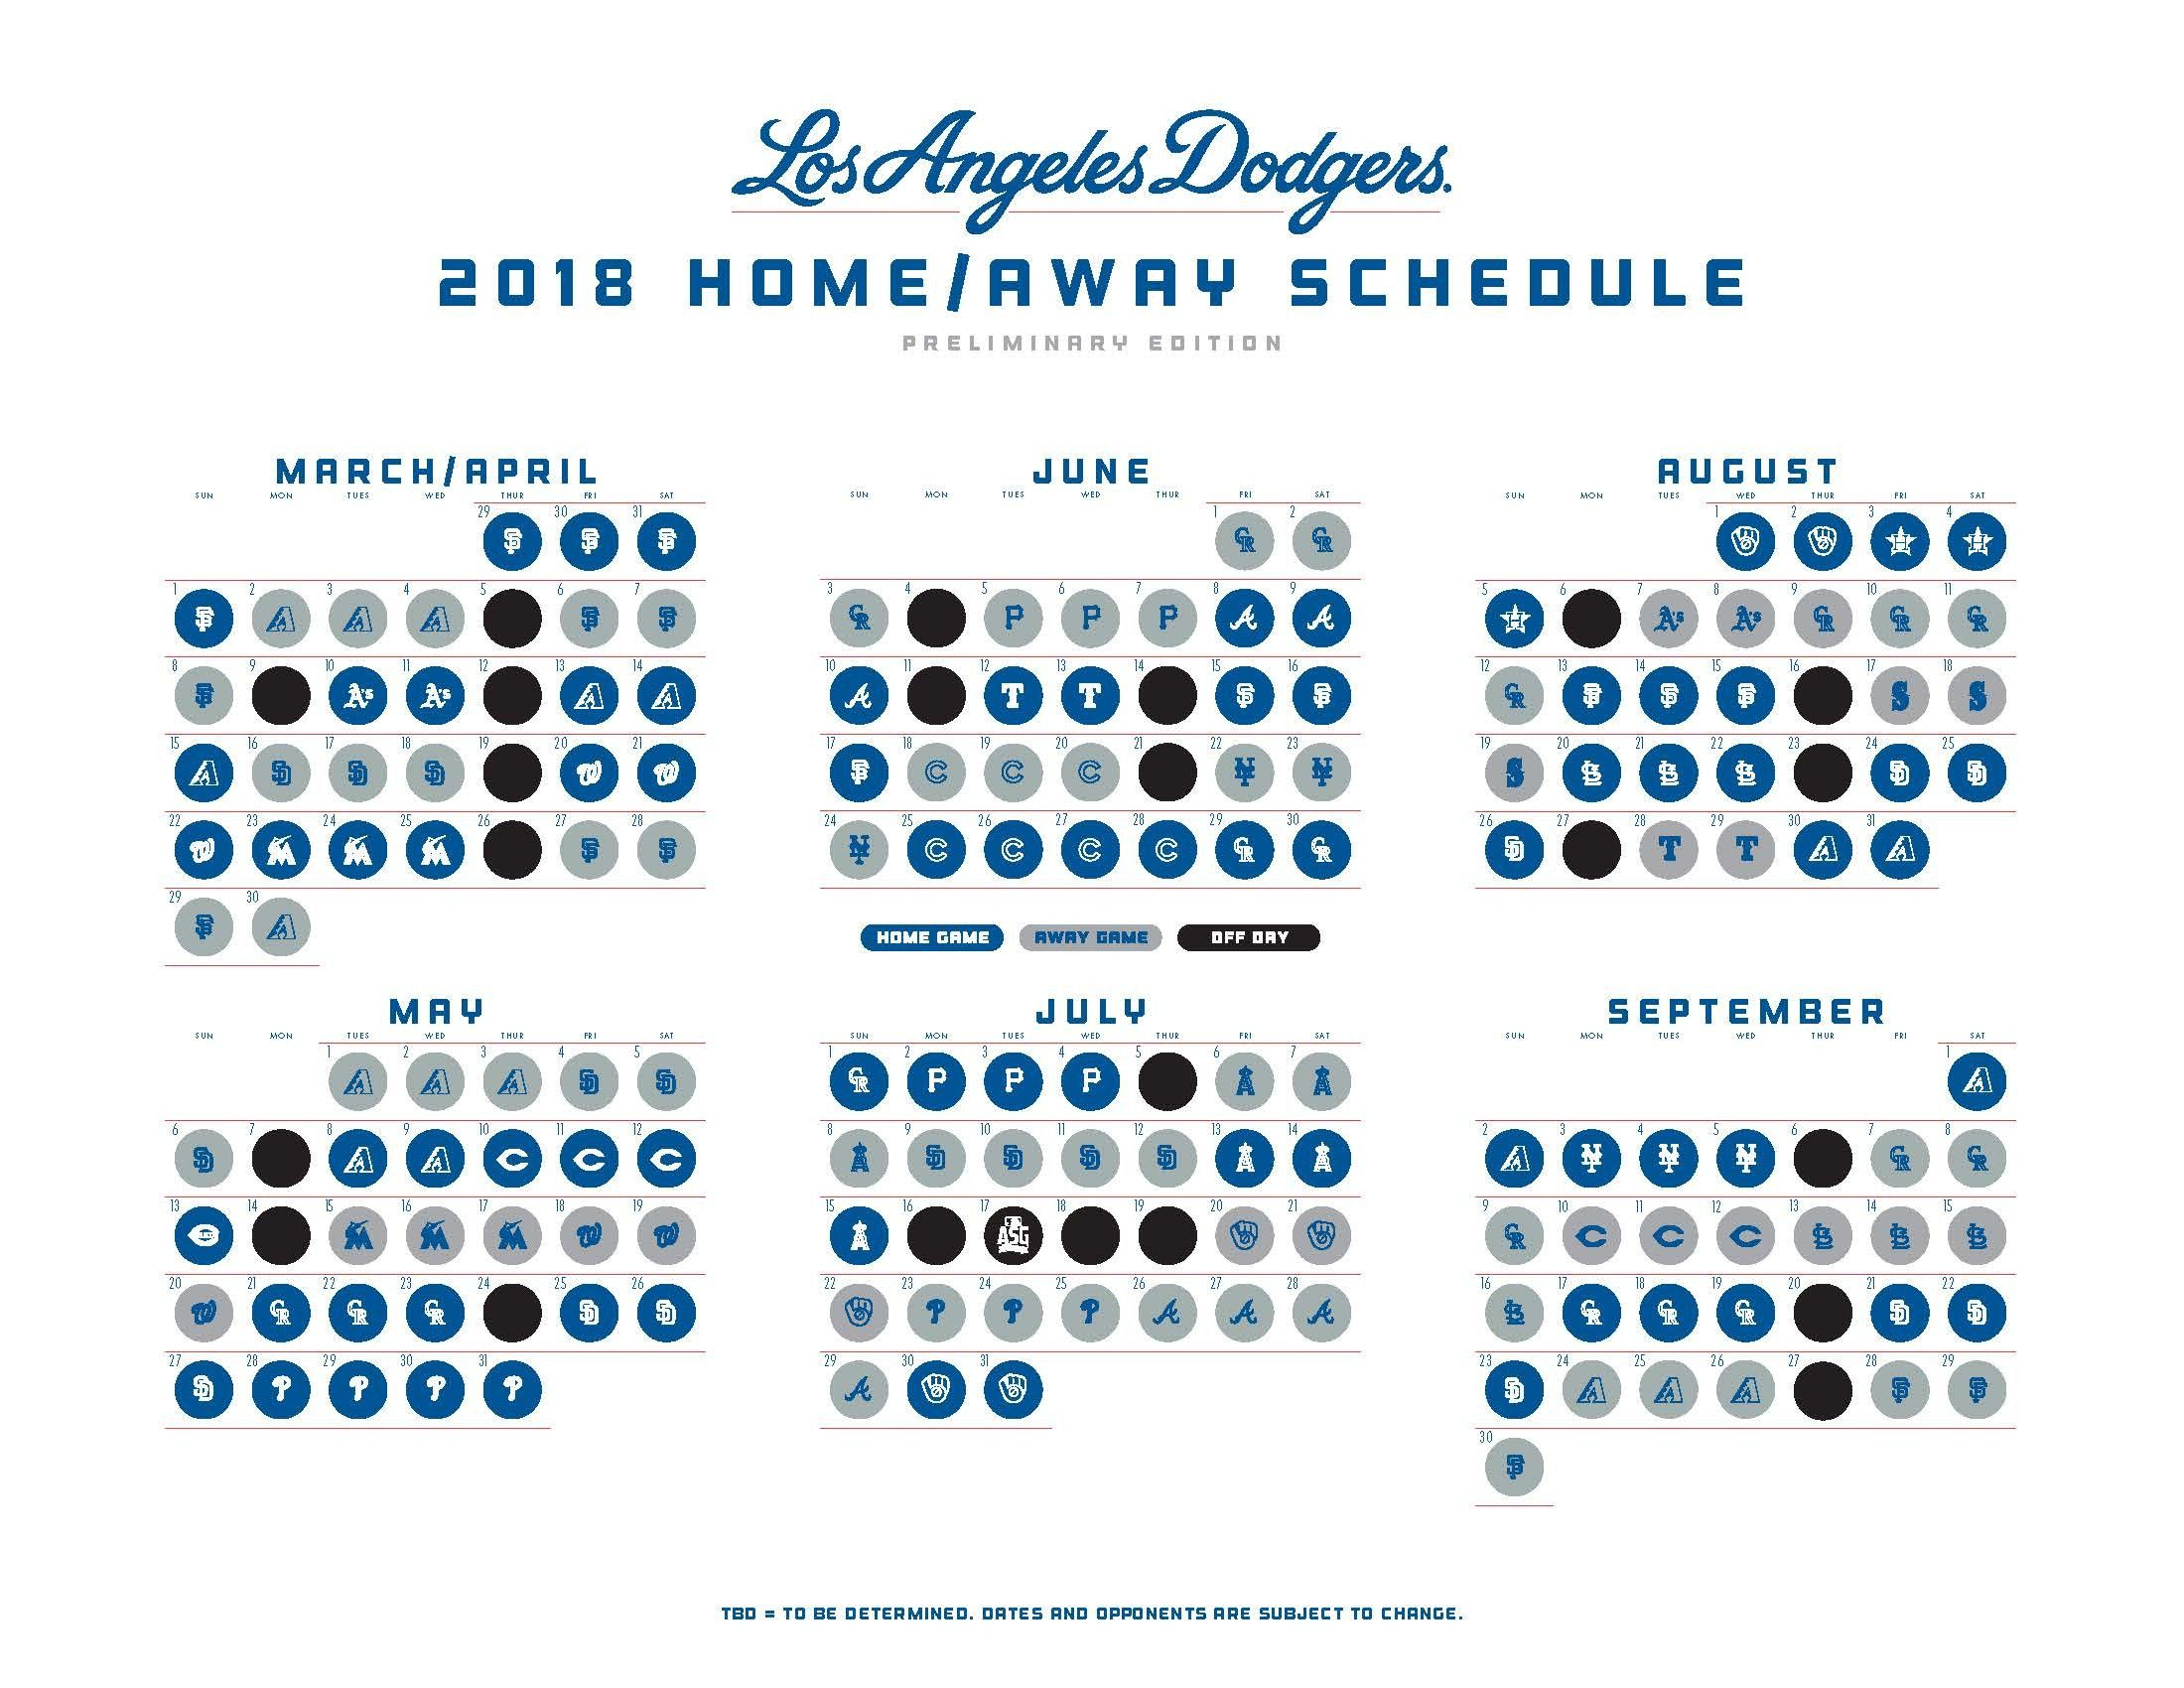 Dodgers Game Schedule Five Brilliant Ways To Advertise Dodgers Game Schedule Dodger Game Dodgers Dodger Stadium